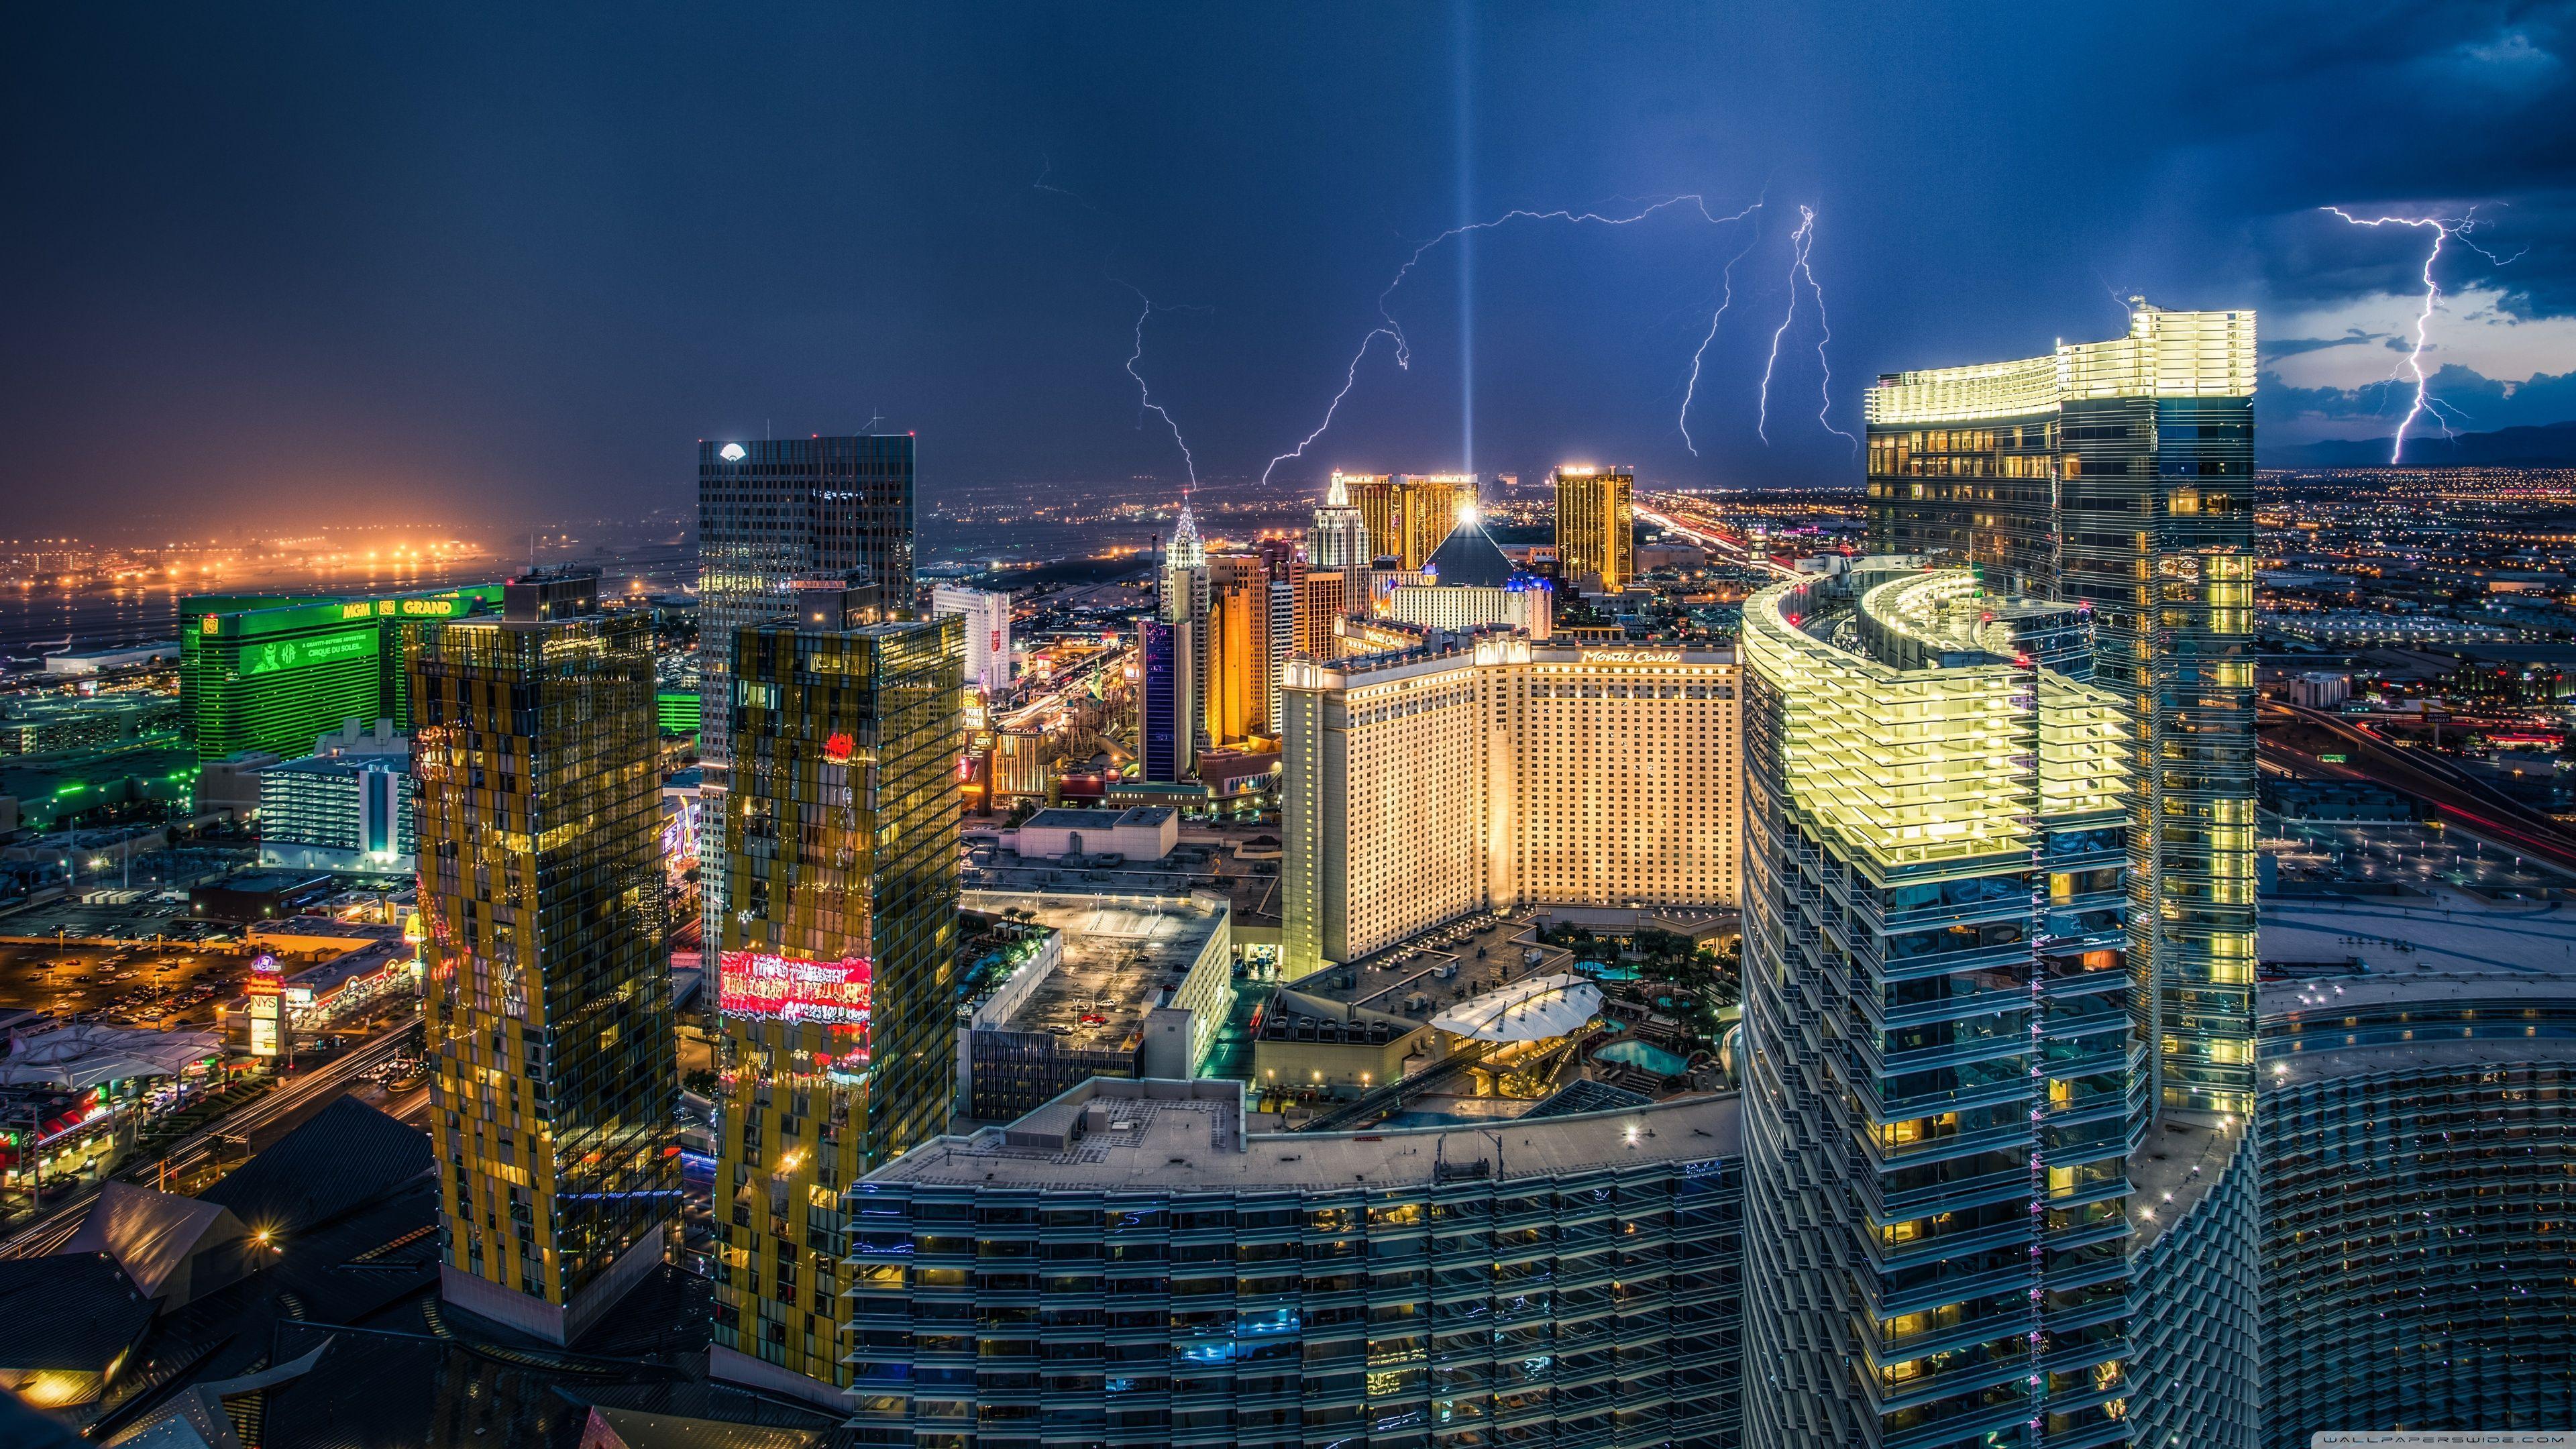 Vegas 4K Wallpapers - Top Free Vegas 4K Backgrounds ...